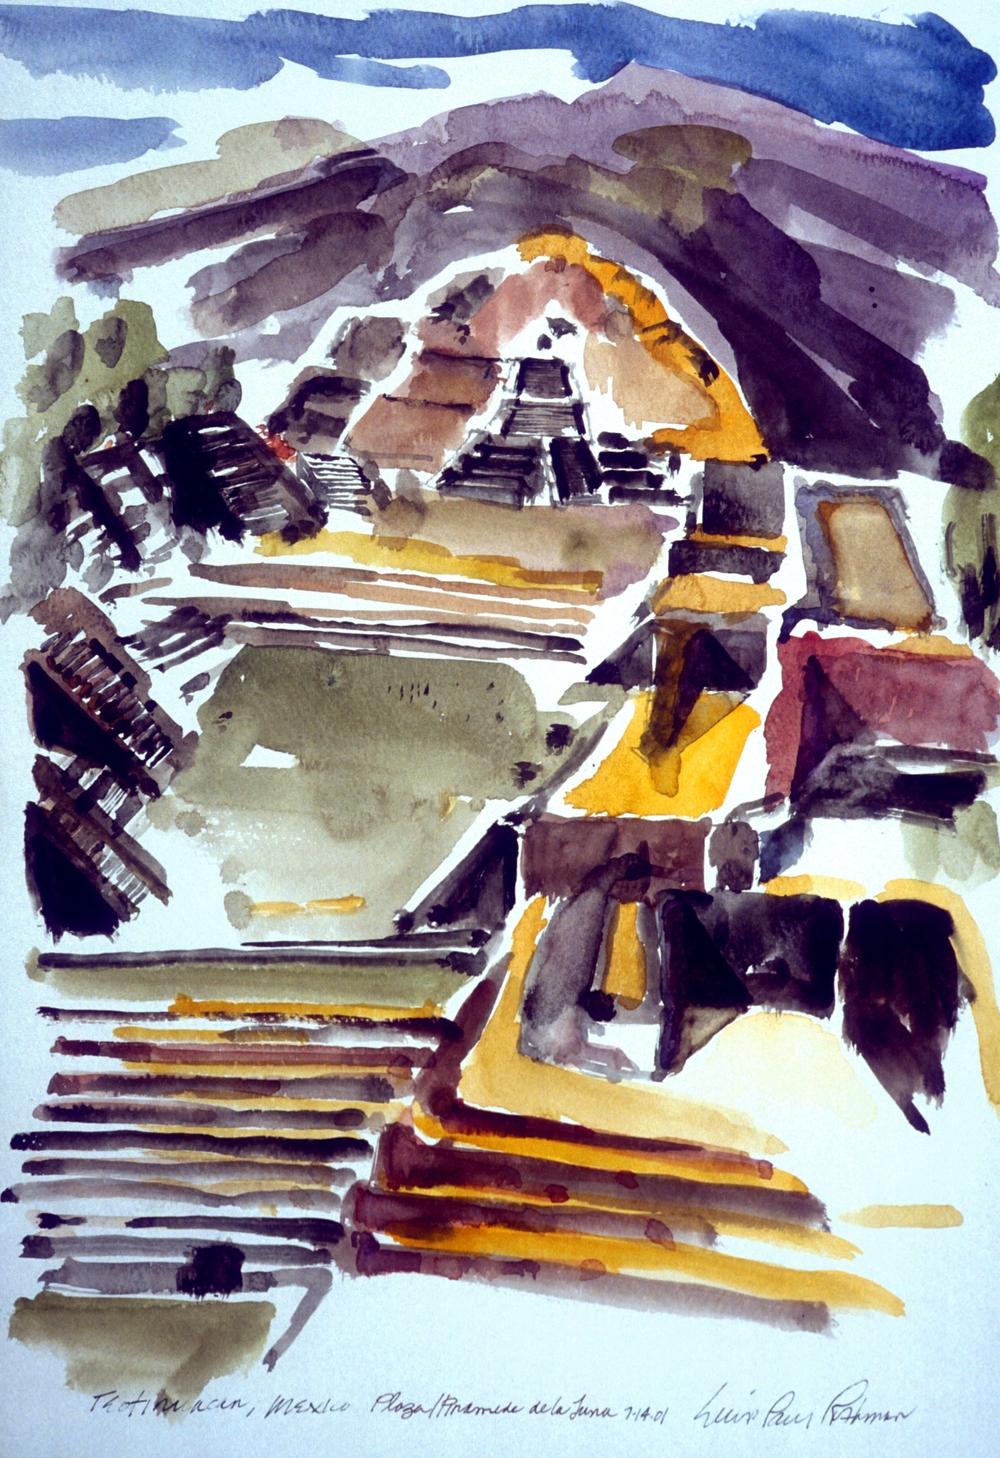 Plaza de la Luna,Teotihuacan